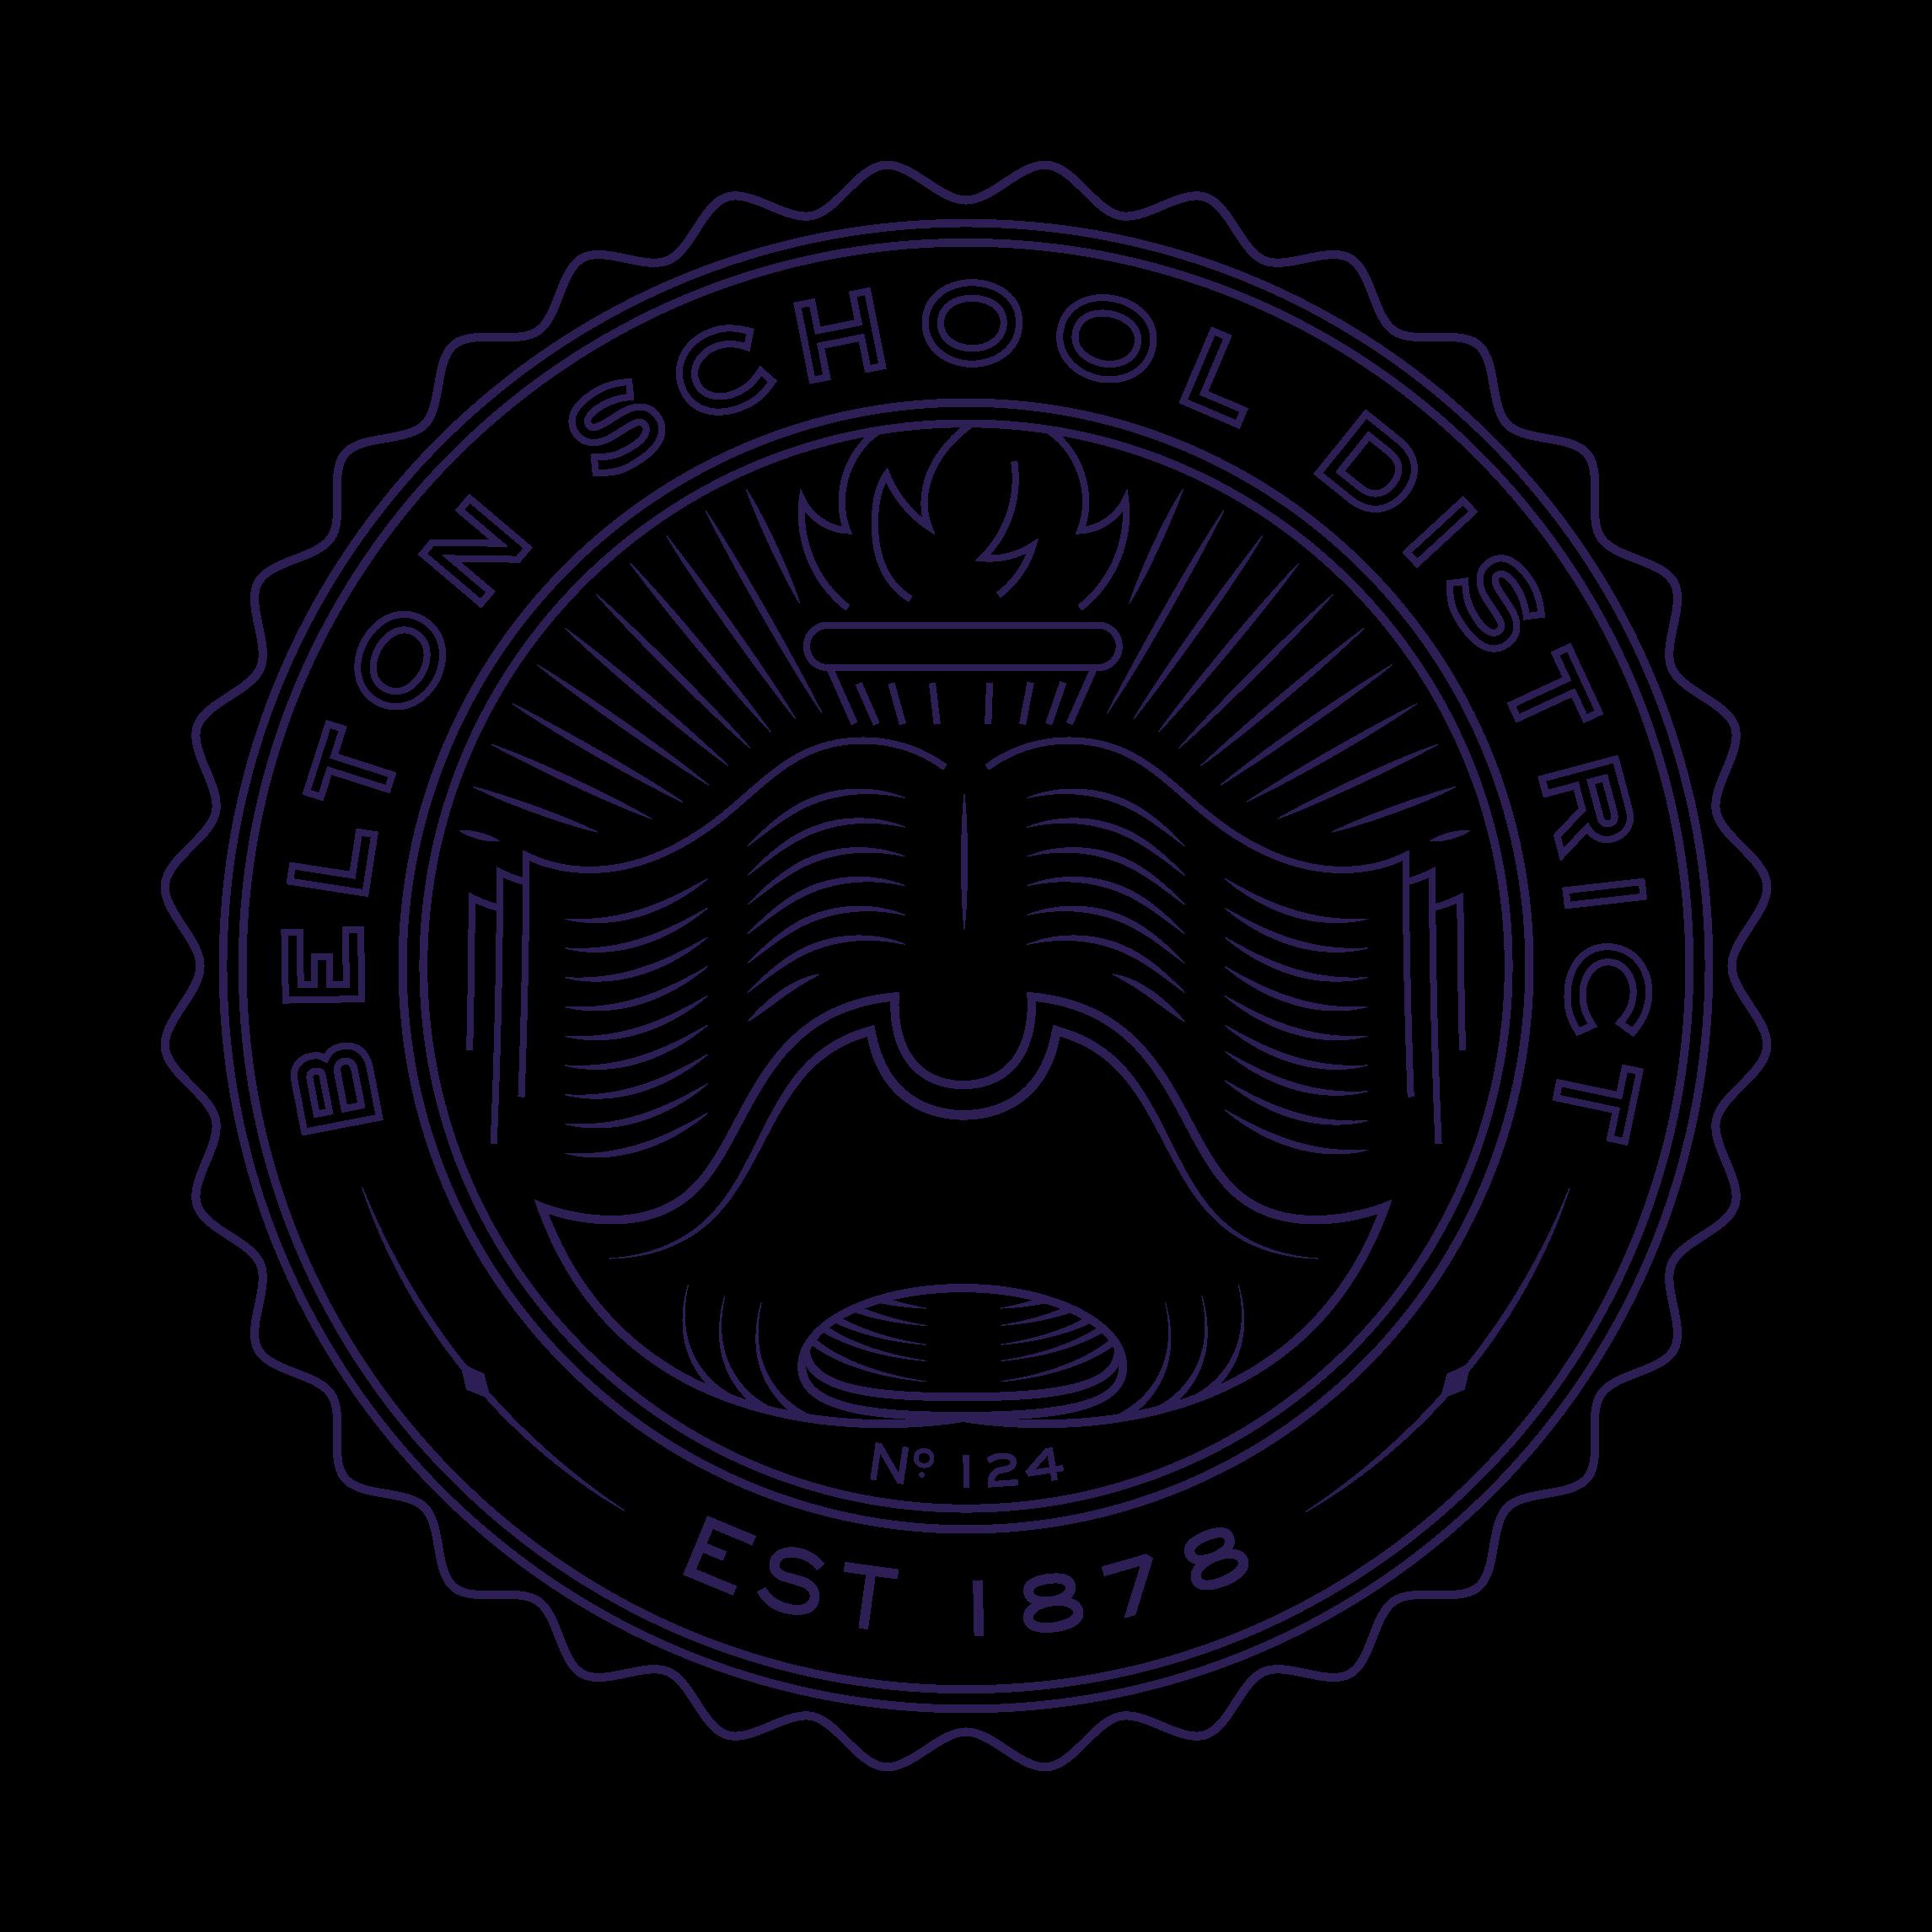 Belton School District 124